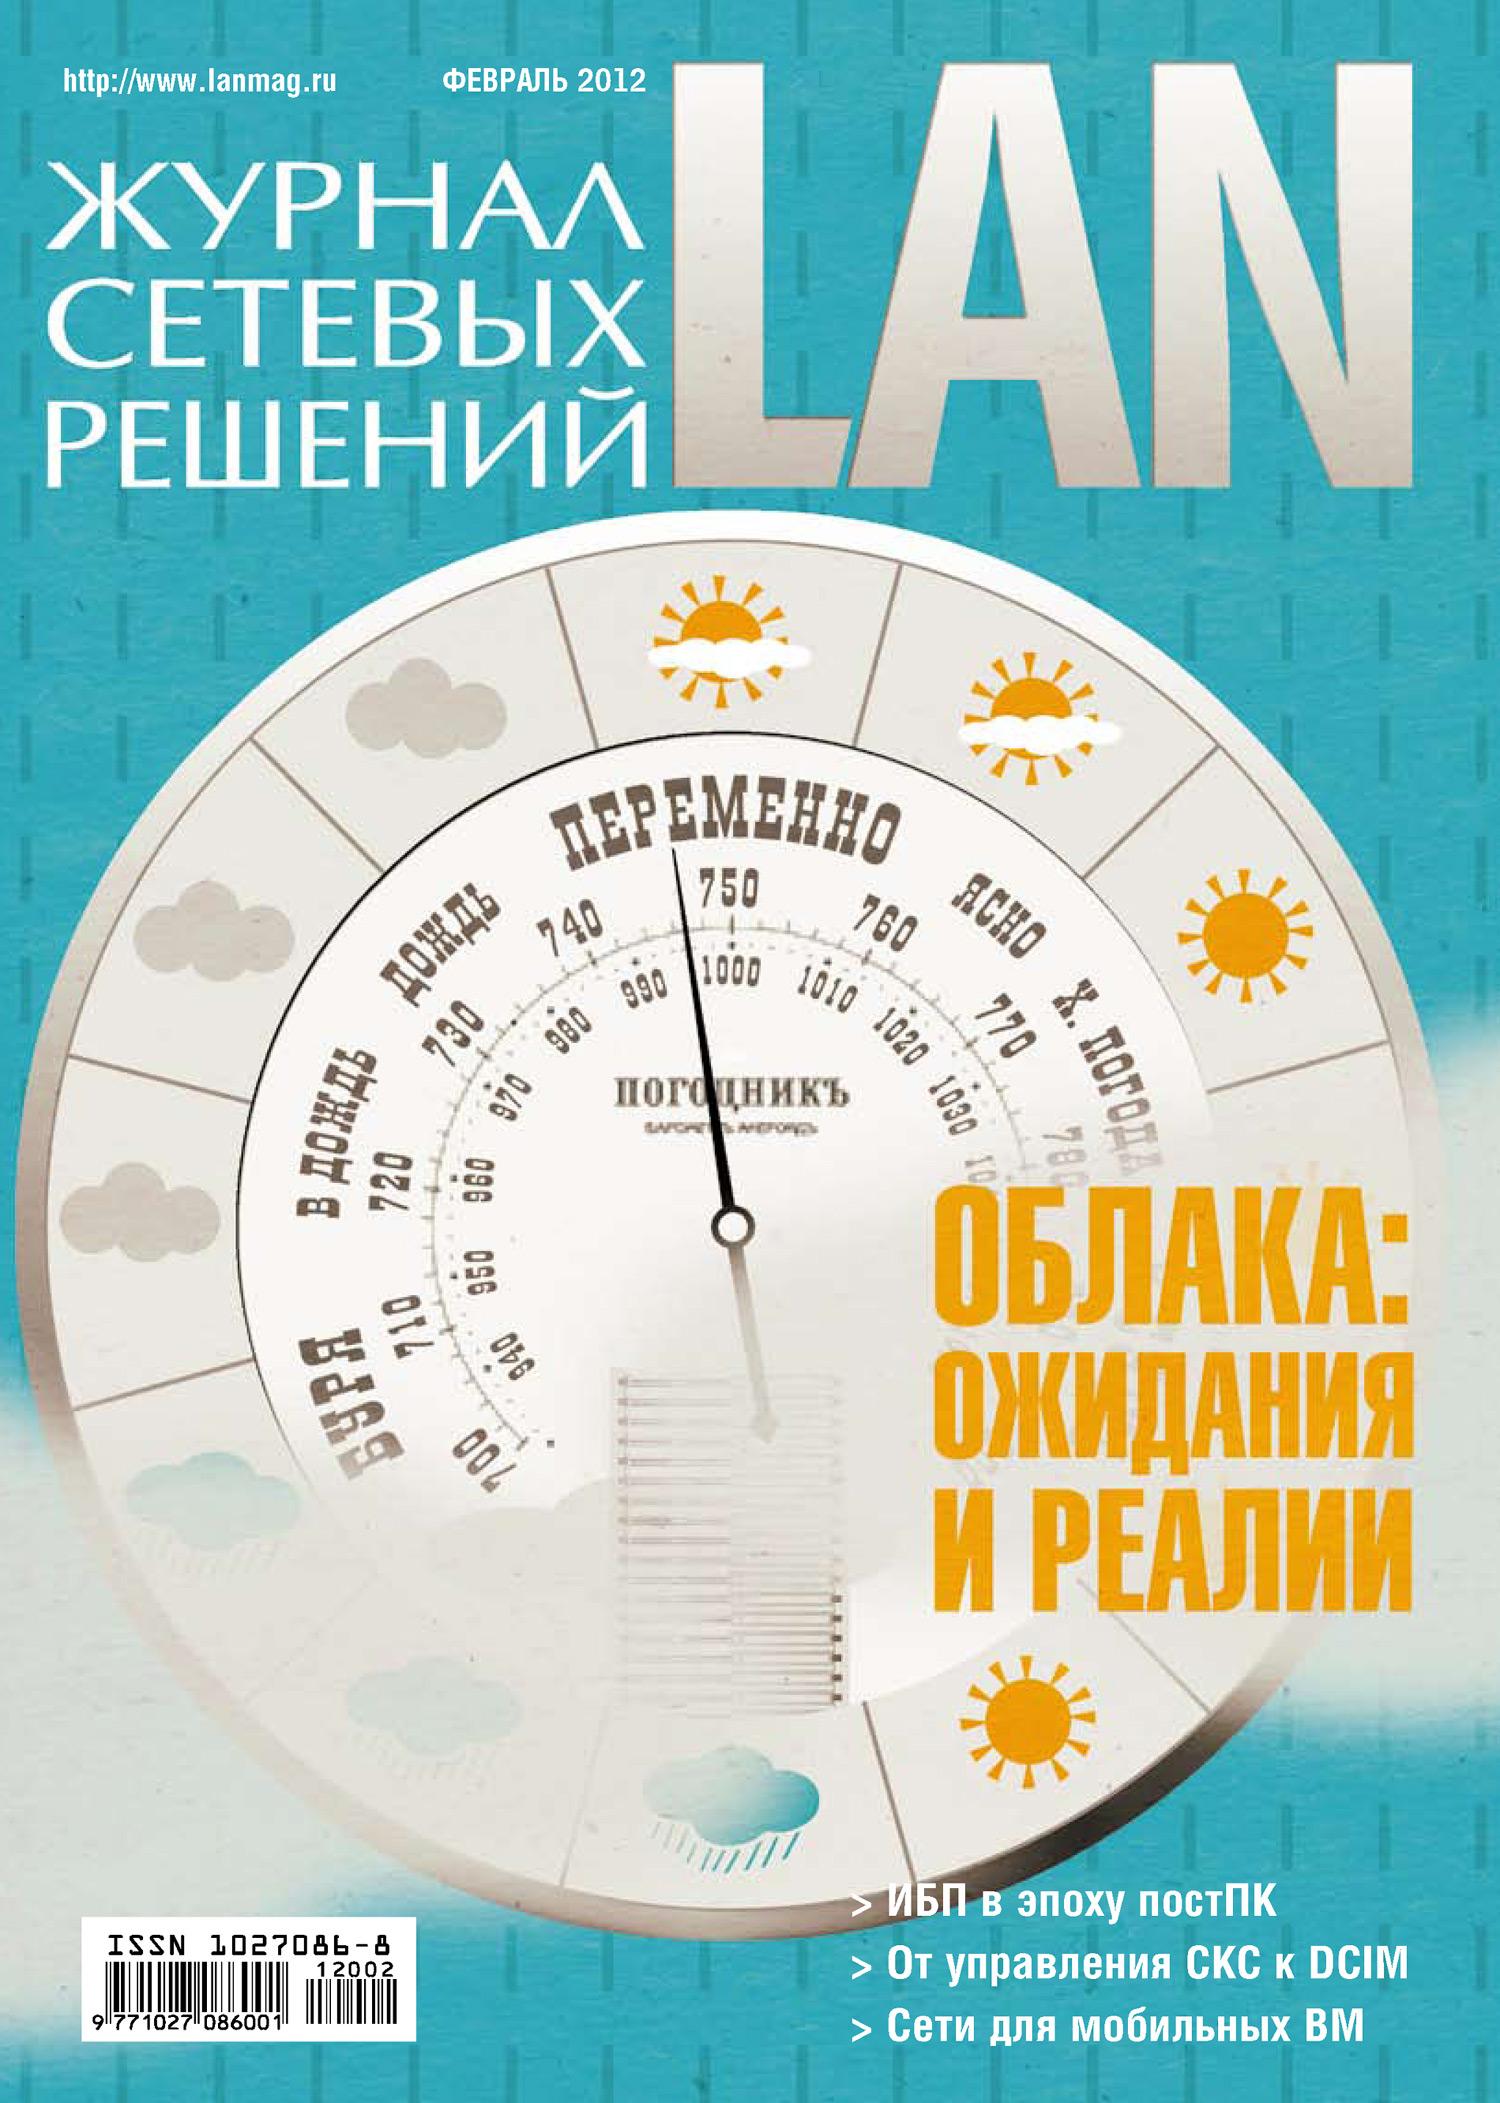 Журнал сетевых решений / LAN №02/2012